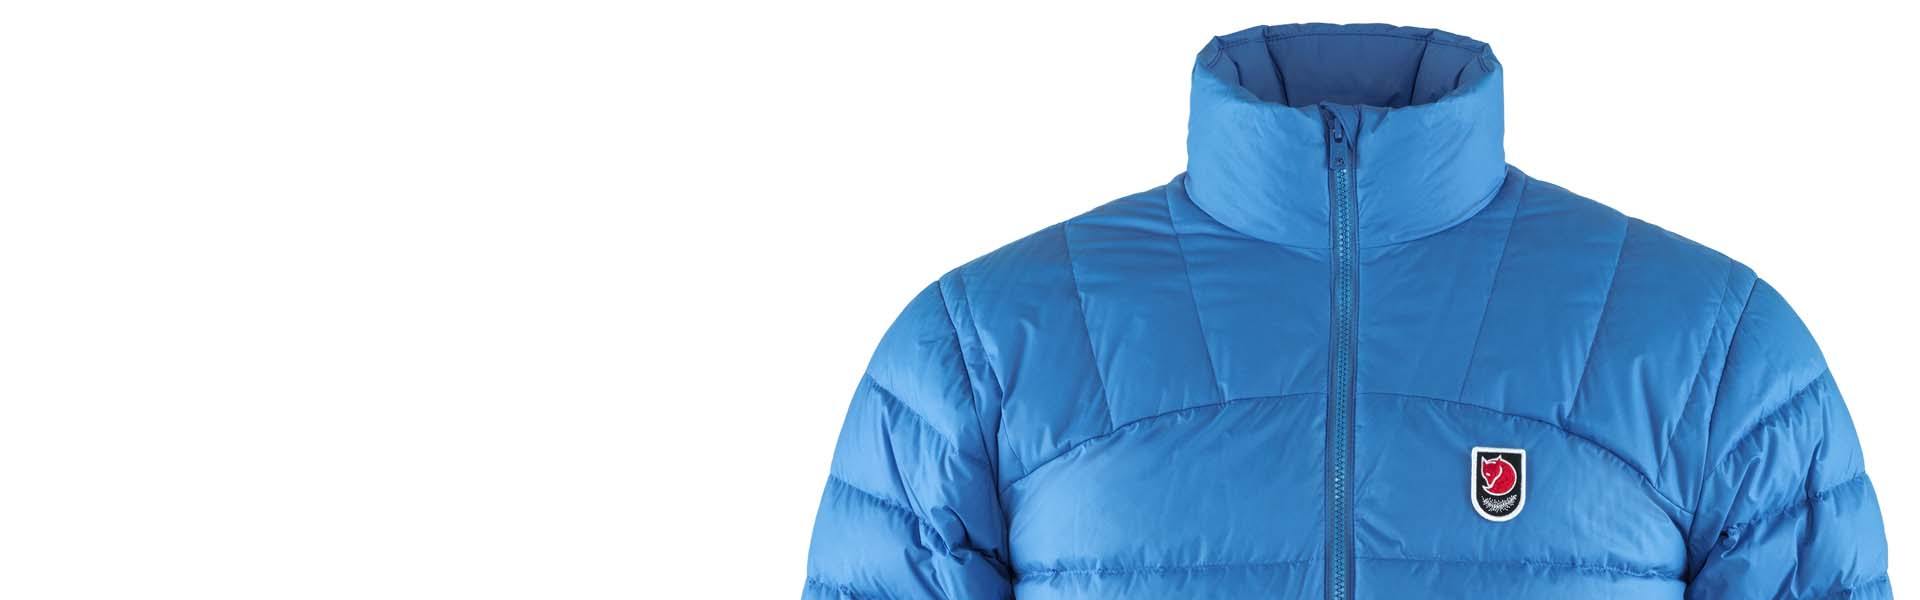 Kisorsoltuk a Fjällräven Expedition Pack Down kabátot